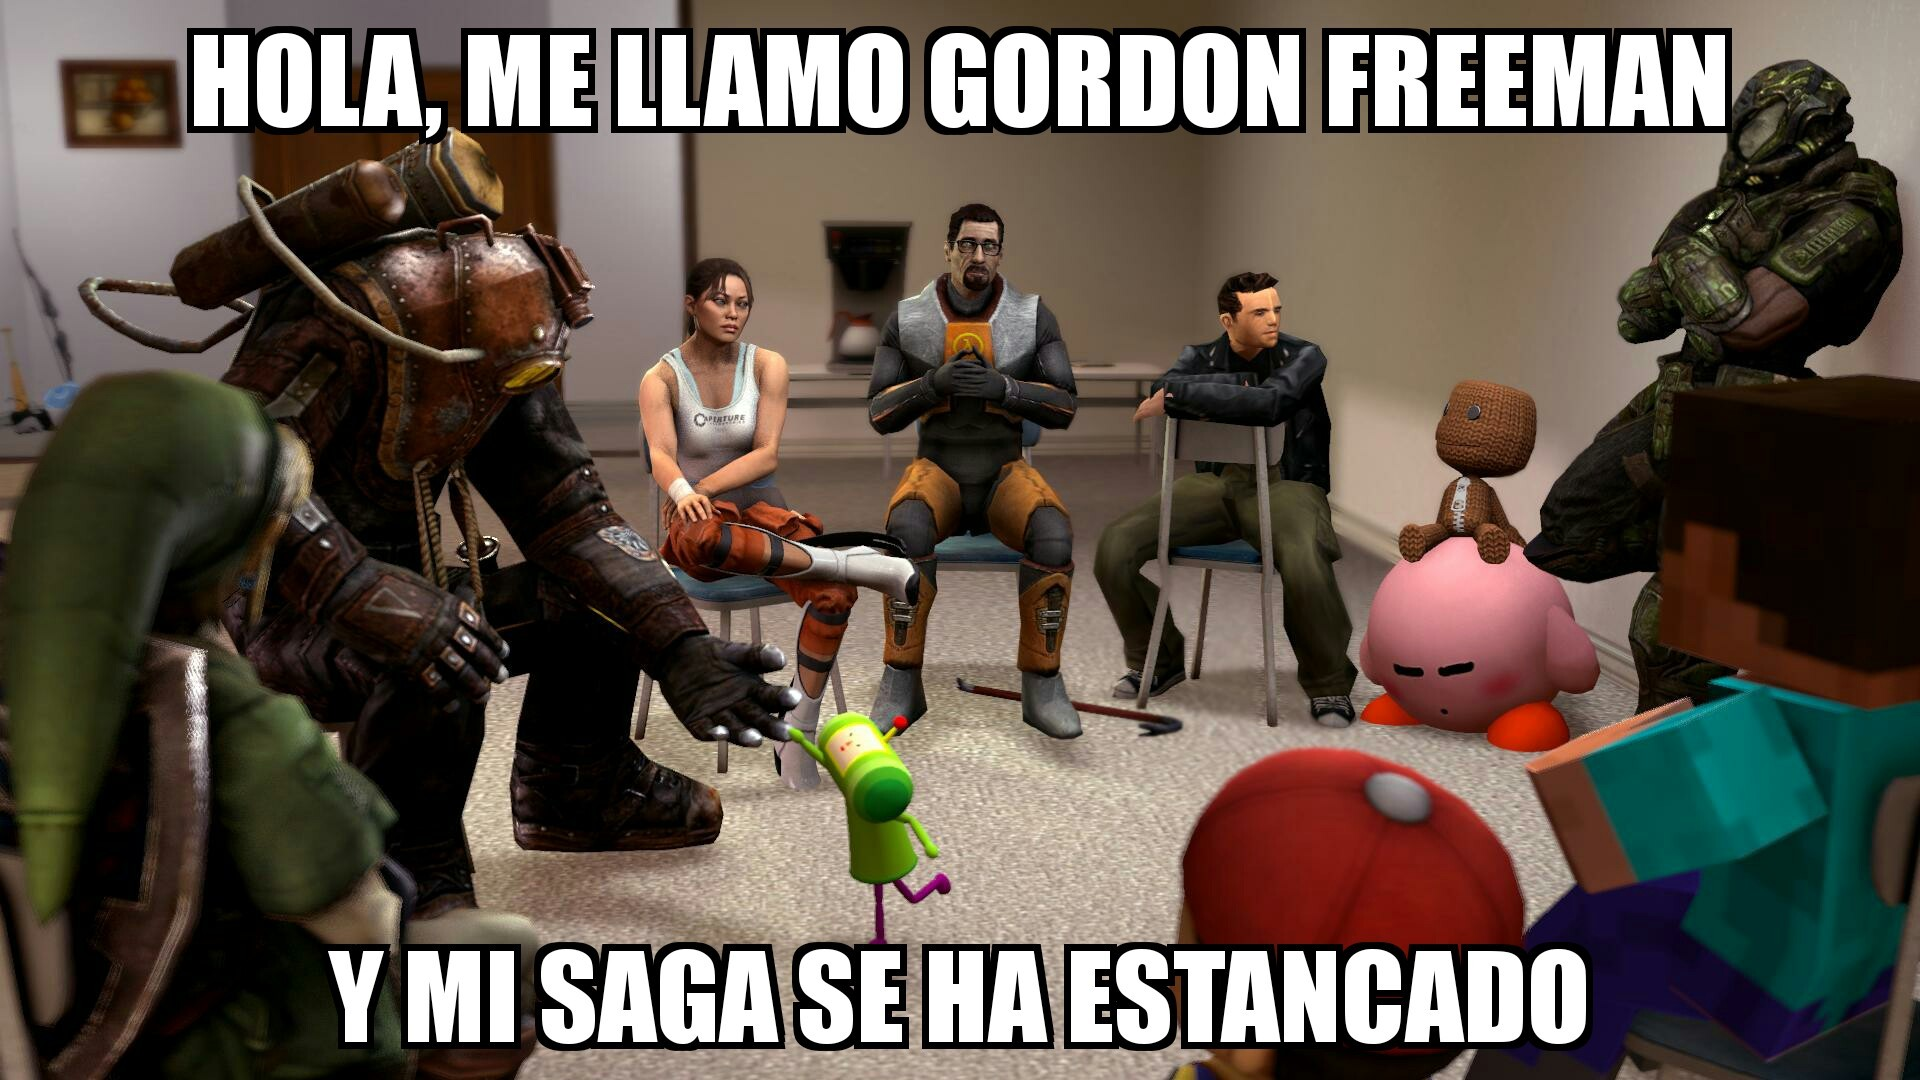 Gaben please - meme